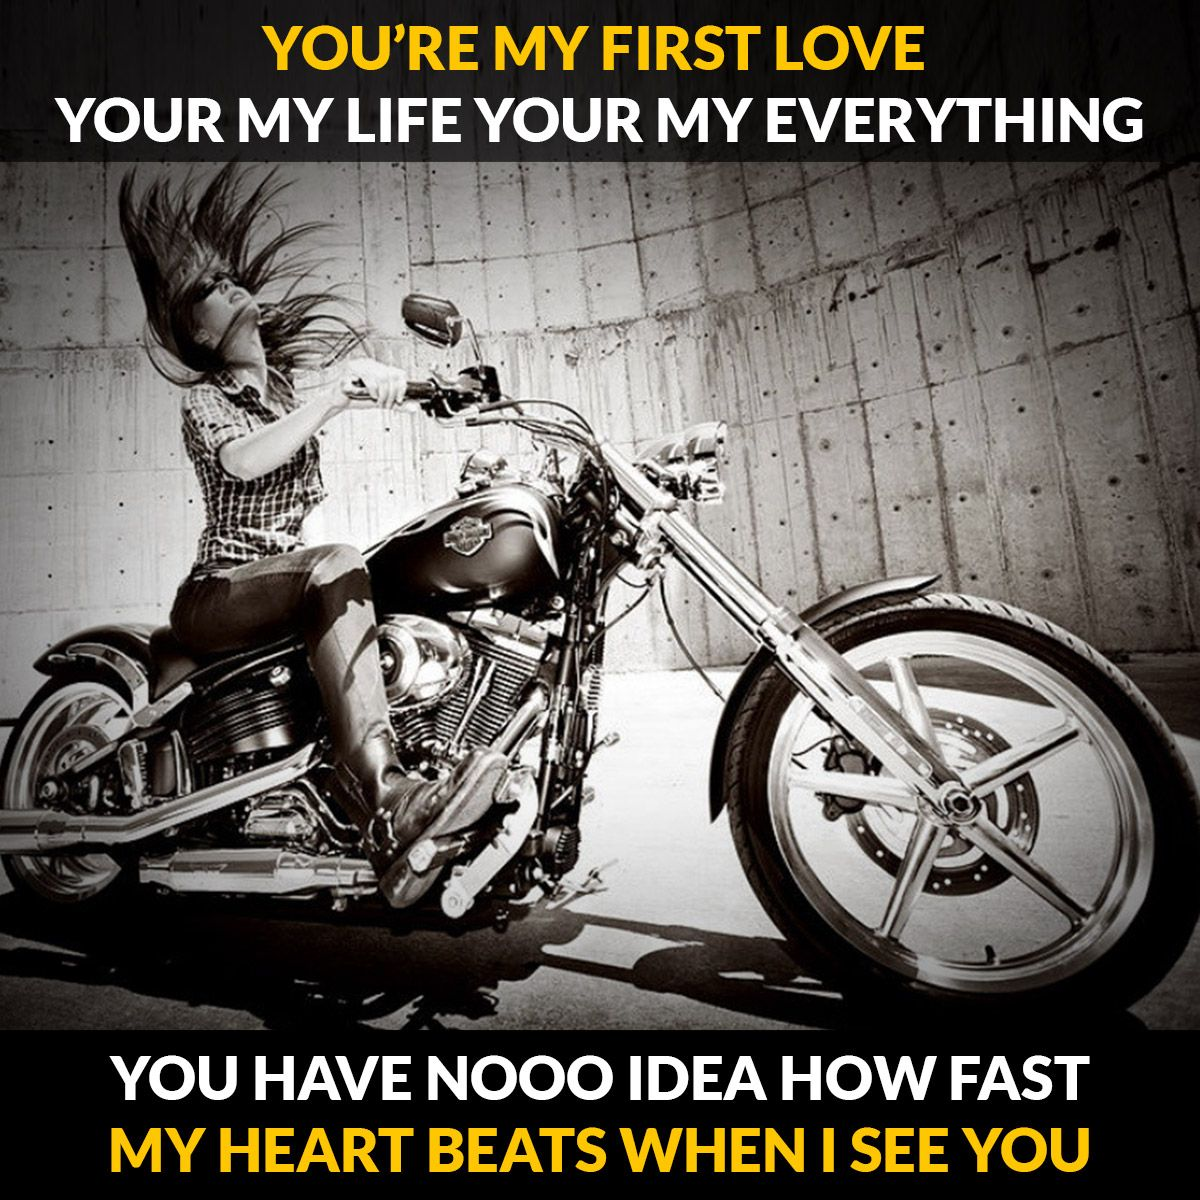 Bike lover harley davidson knucklehead harley davidson